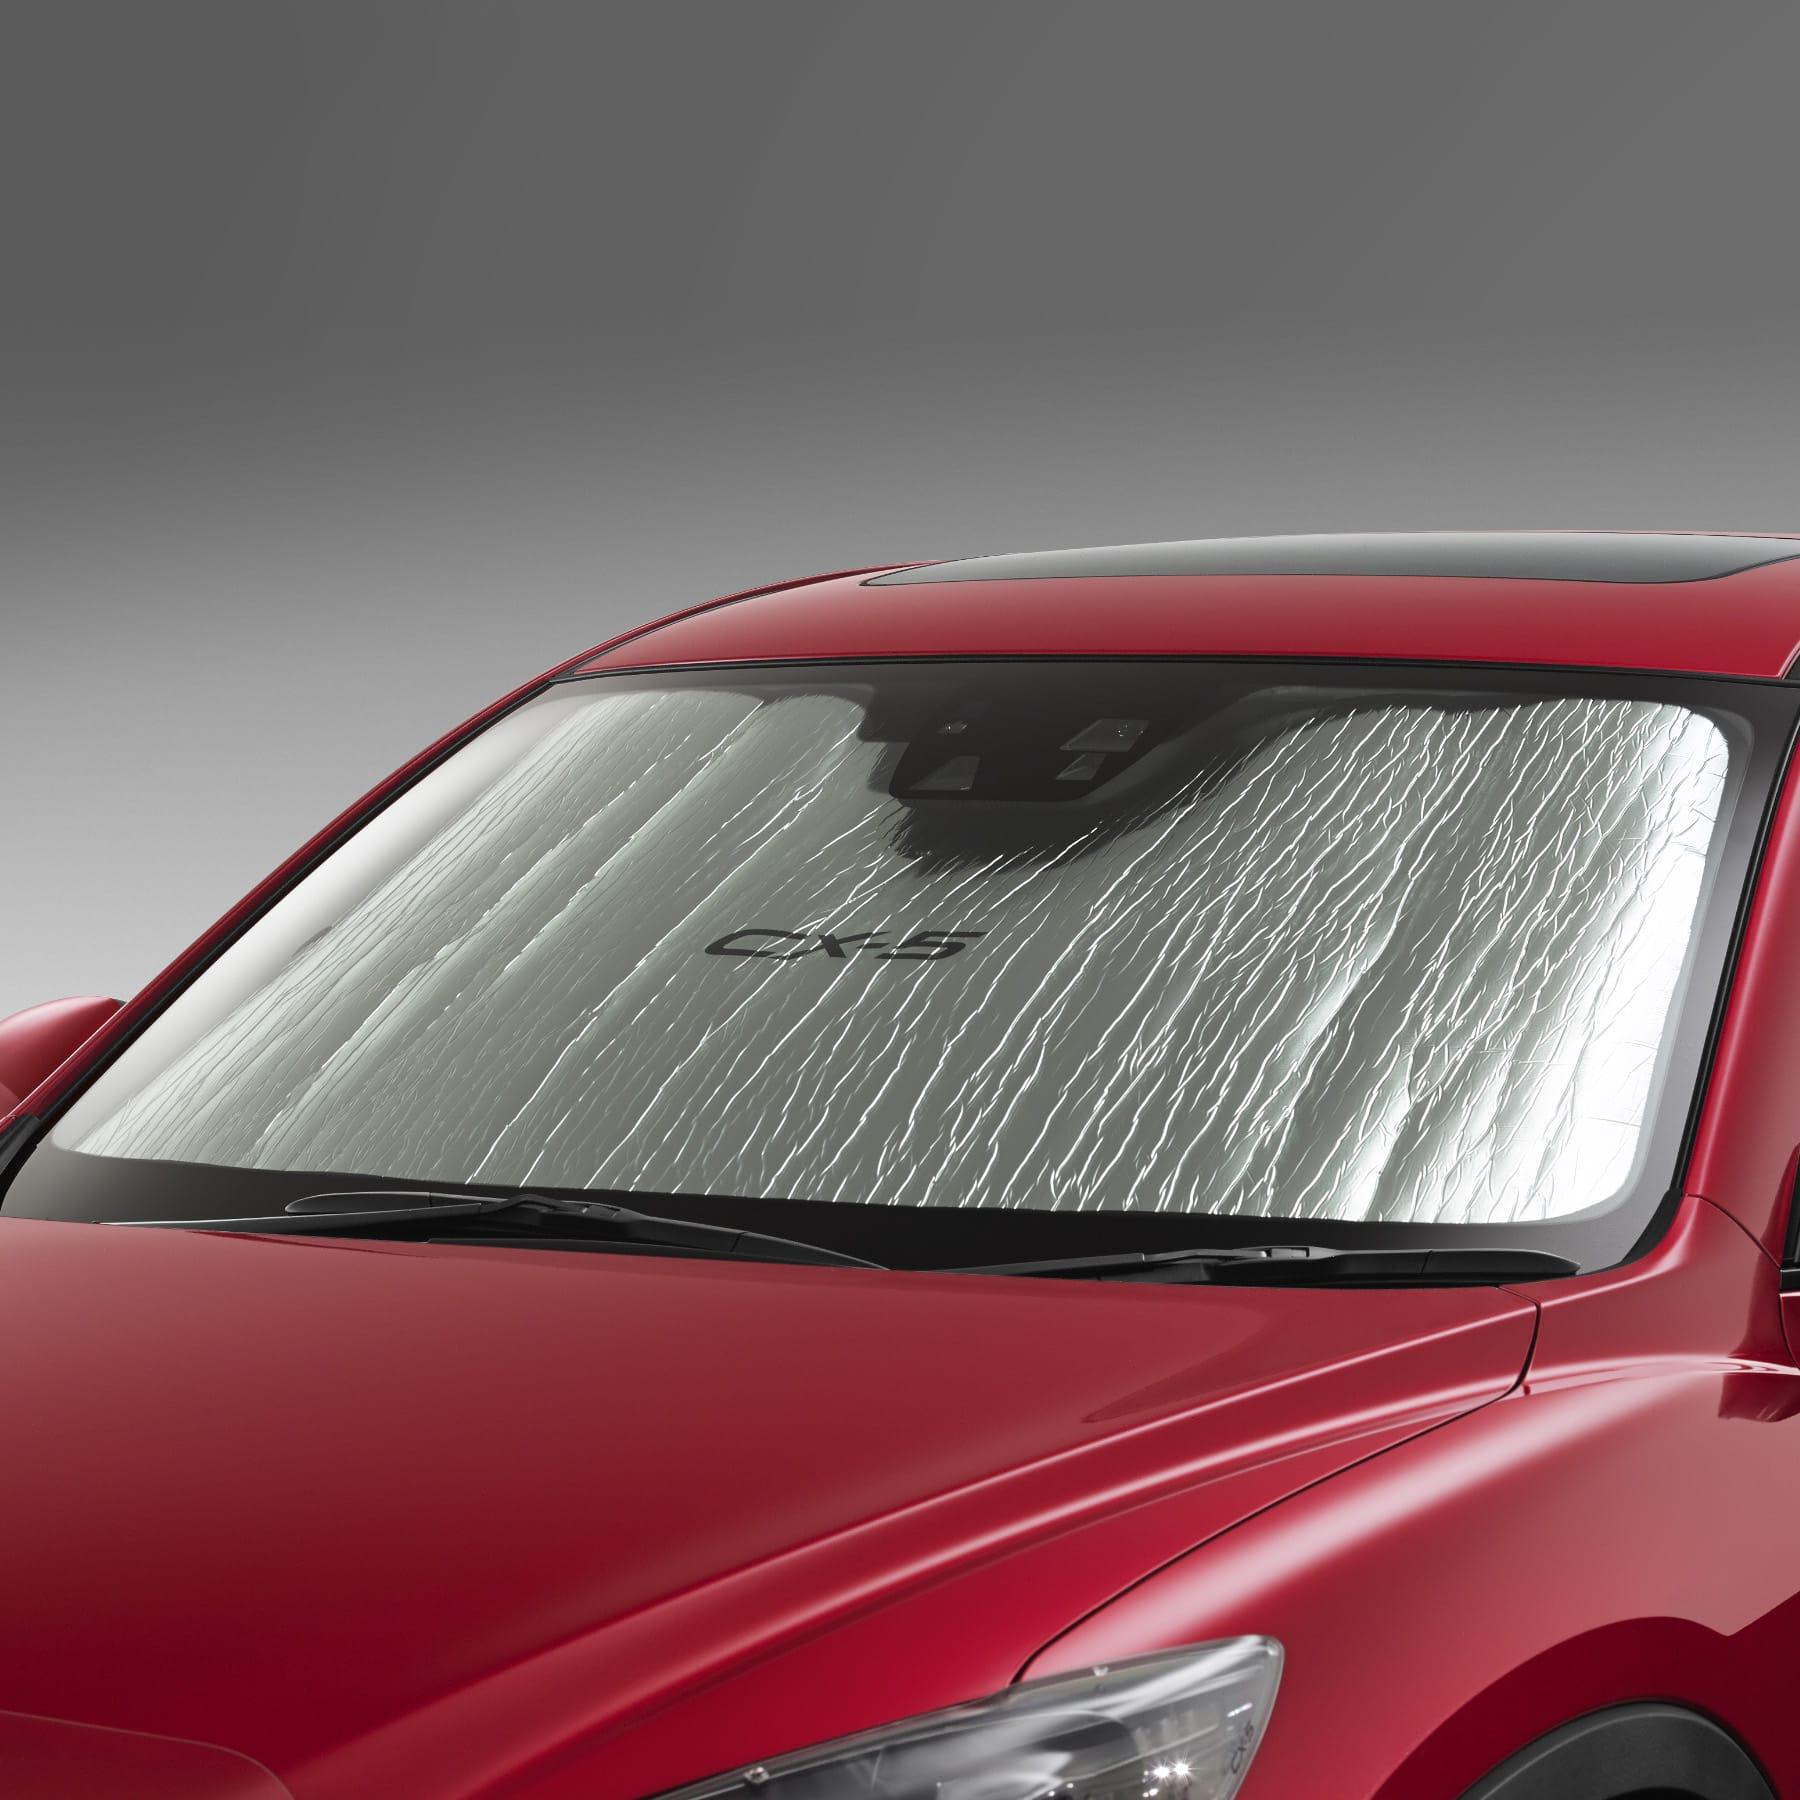 Ke11accss Collapsible Sun Screen Mazda Accessories